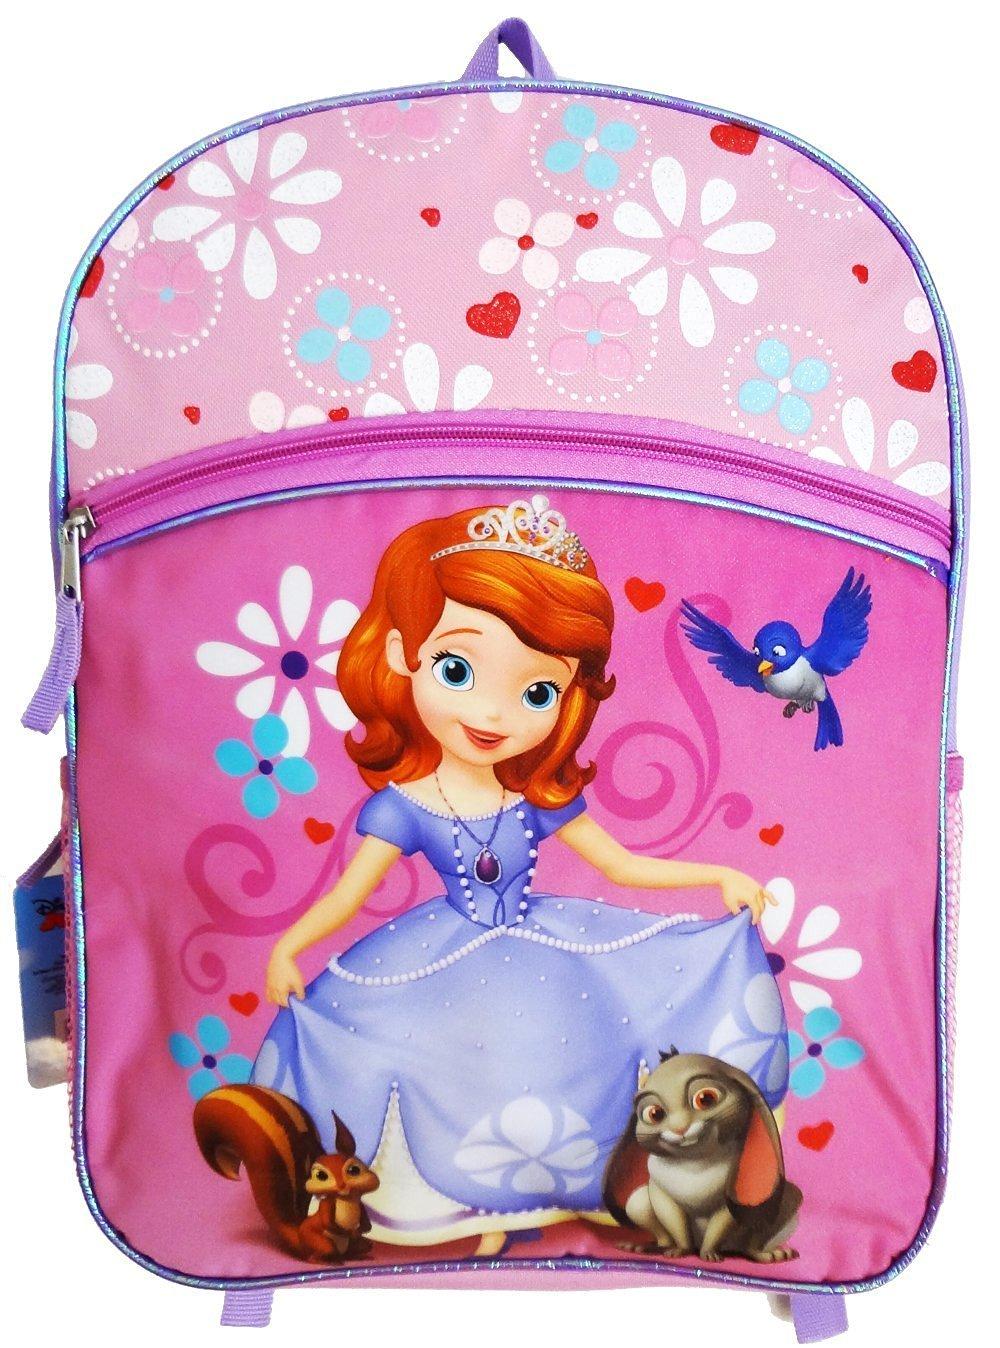 62d3b5d03aa Get Quotations · Disney Little Princess Sofia the First Fairy 16